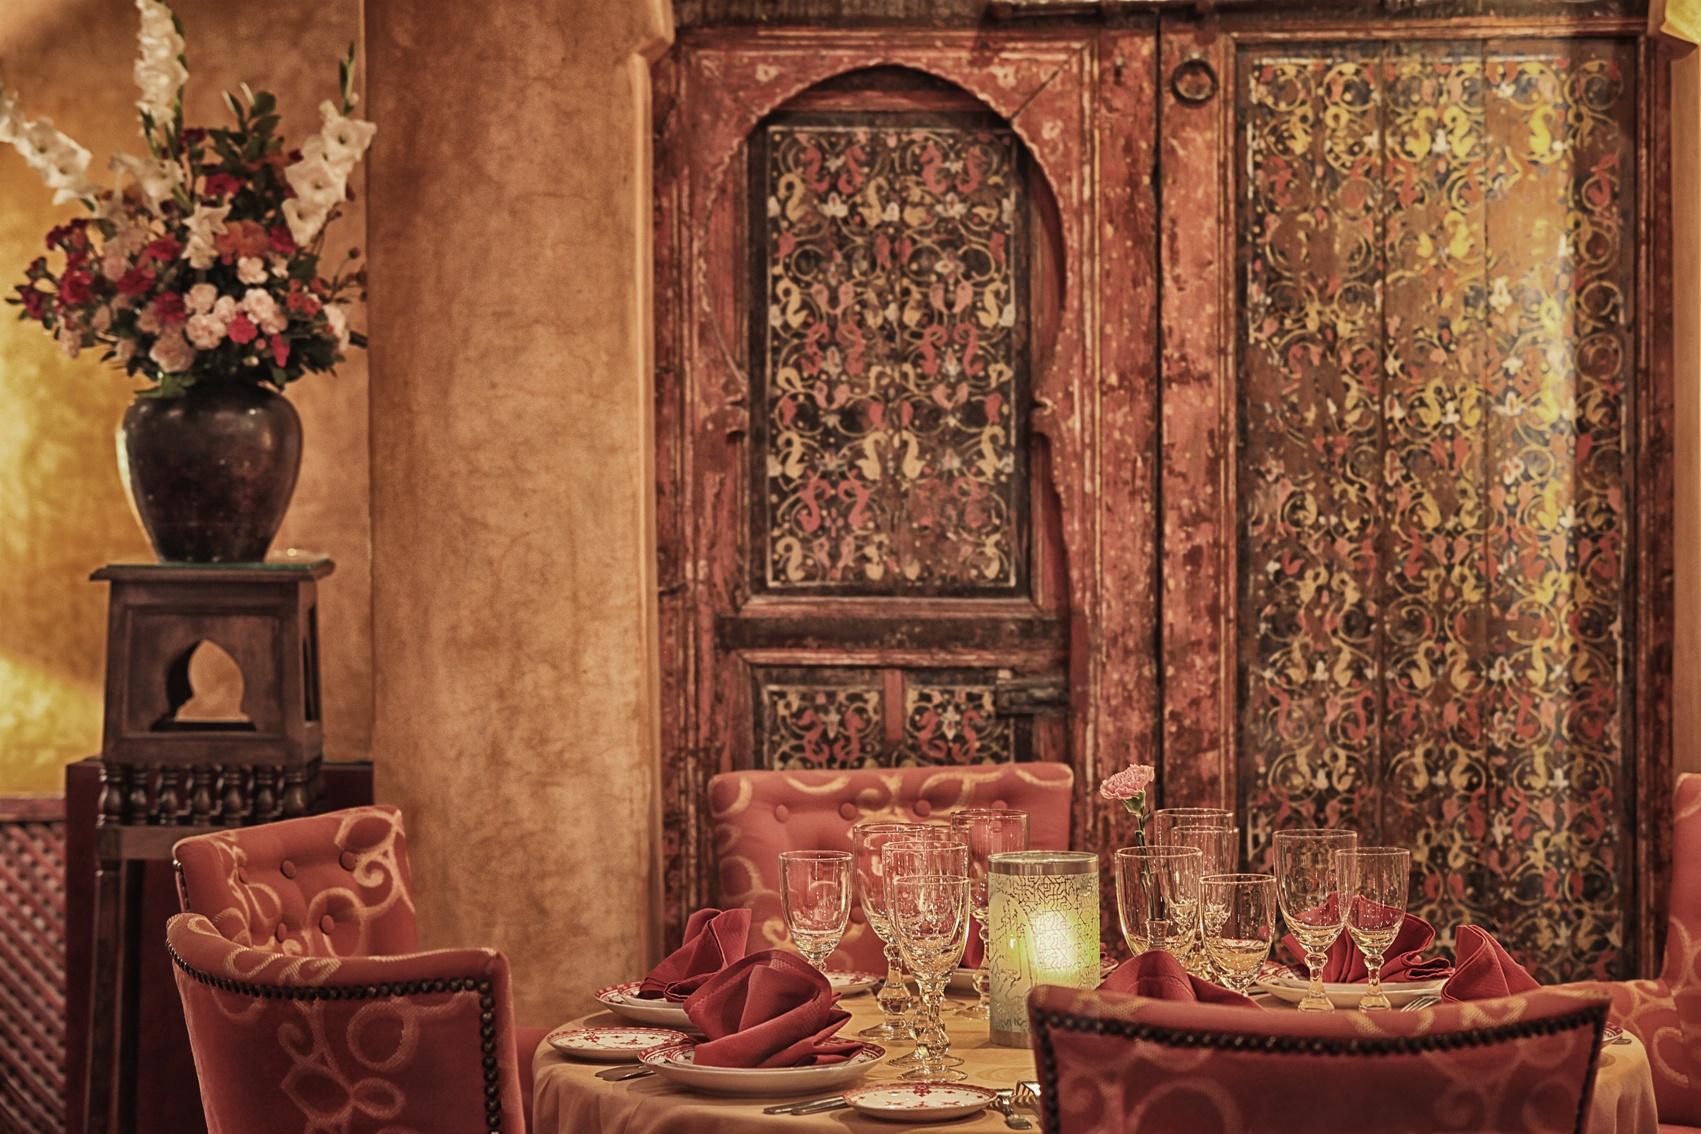 The Moroccan Restaurant